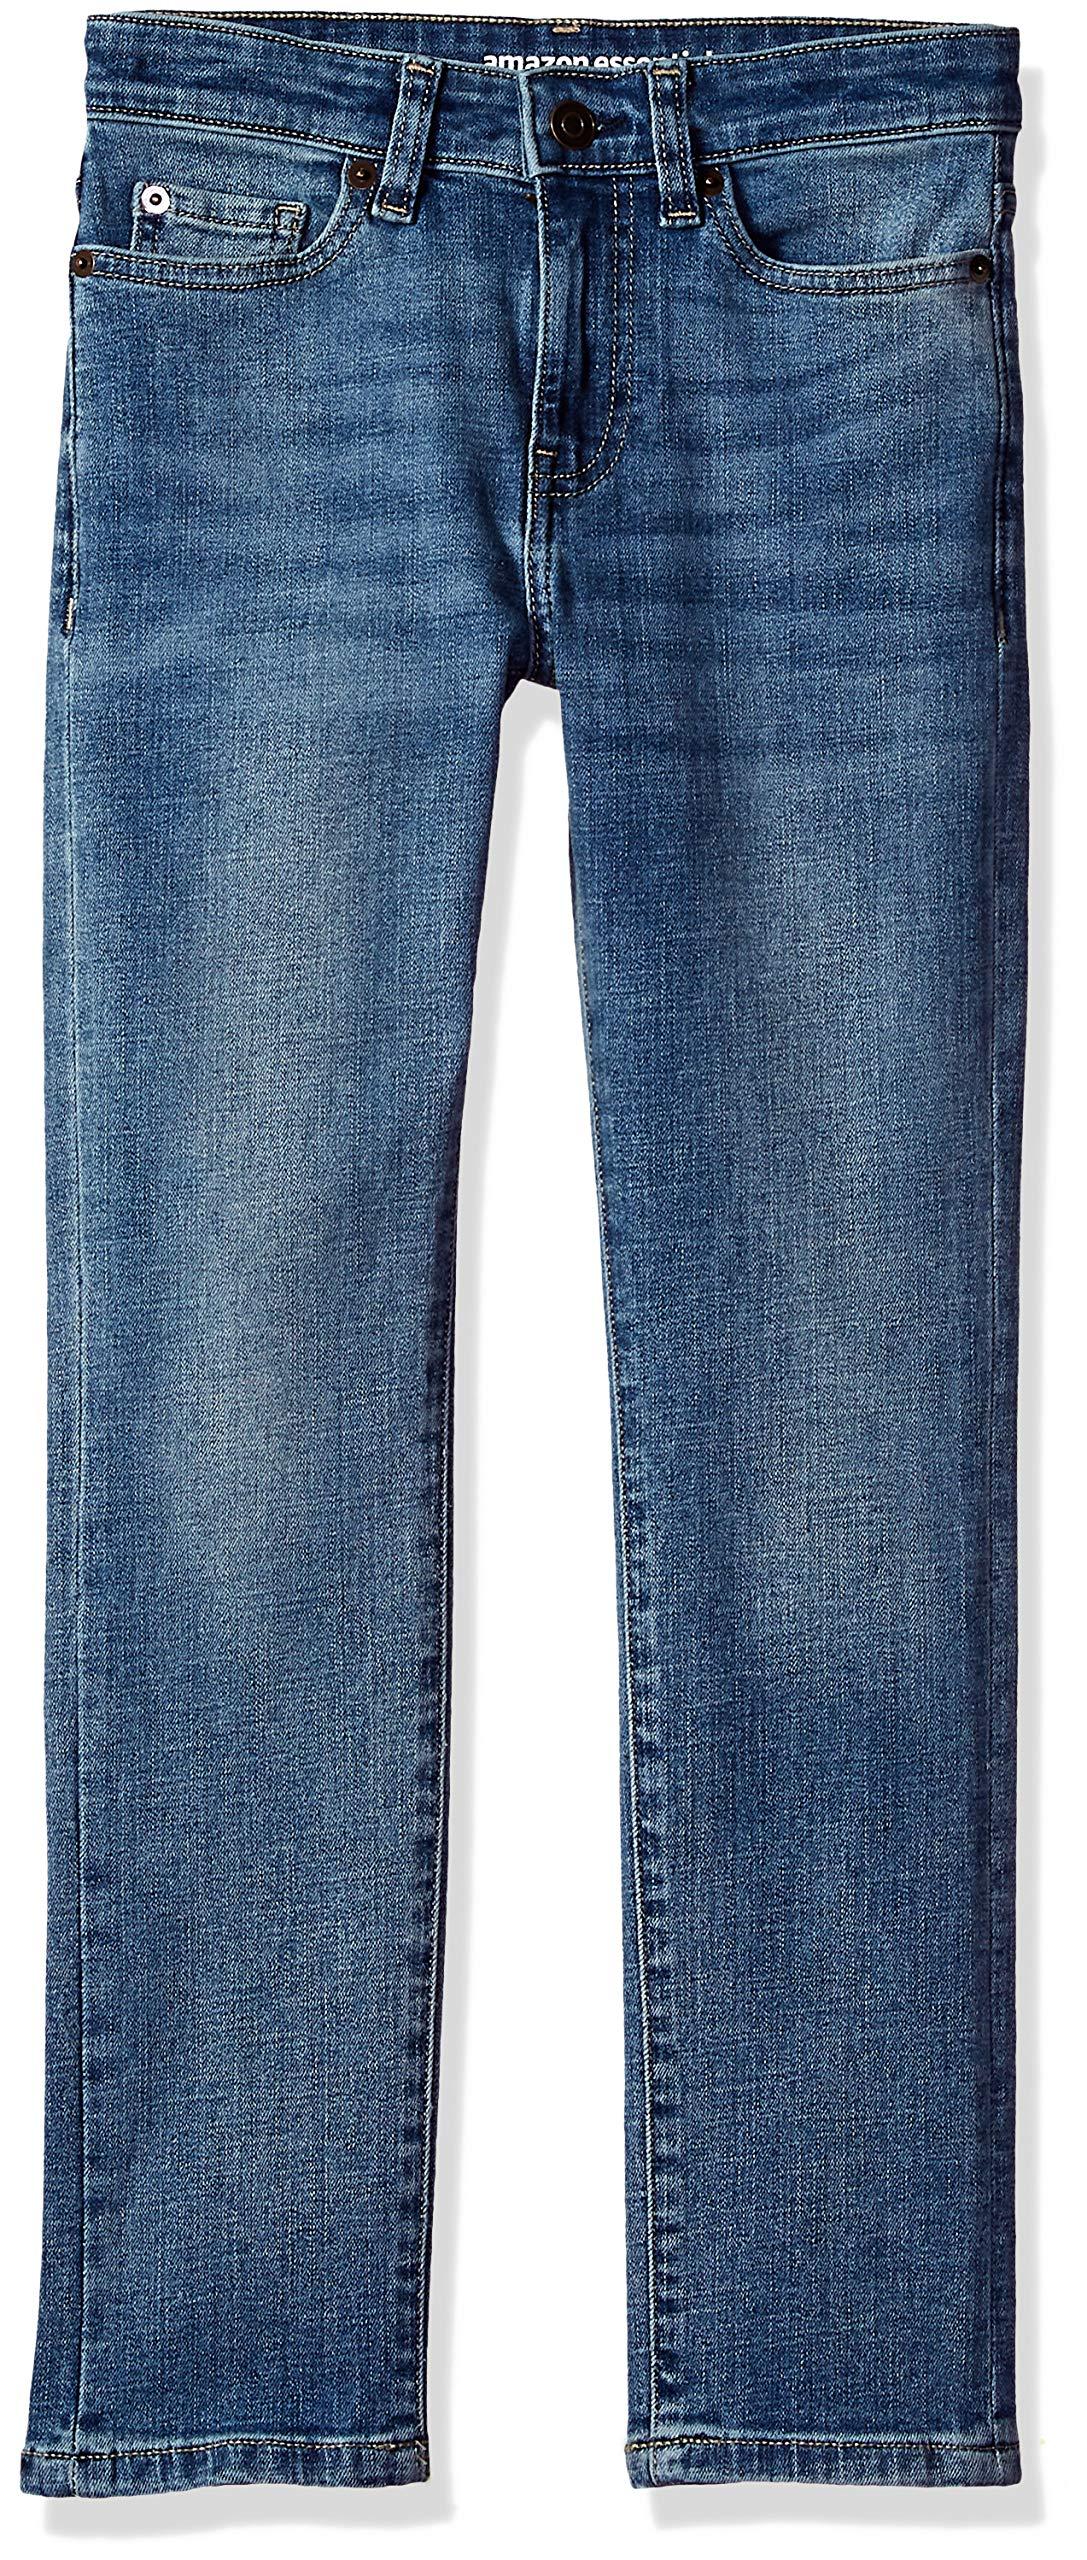 Amazon Essentials Big Boys' Slim-Fit Jeans, Doppler/Light Wash,10 by Amazon Essentials